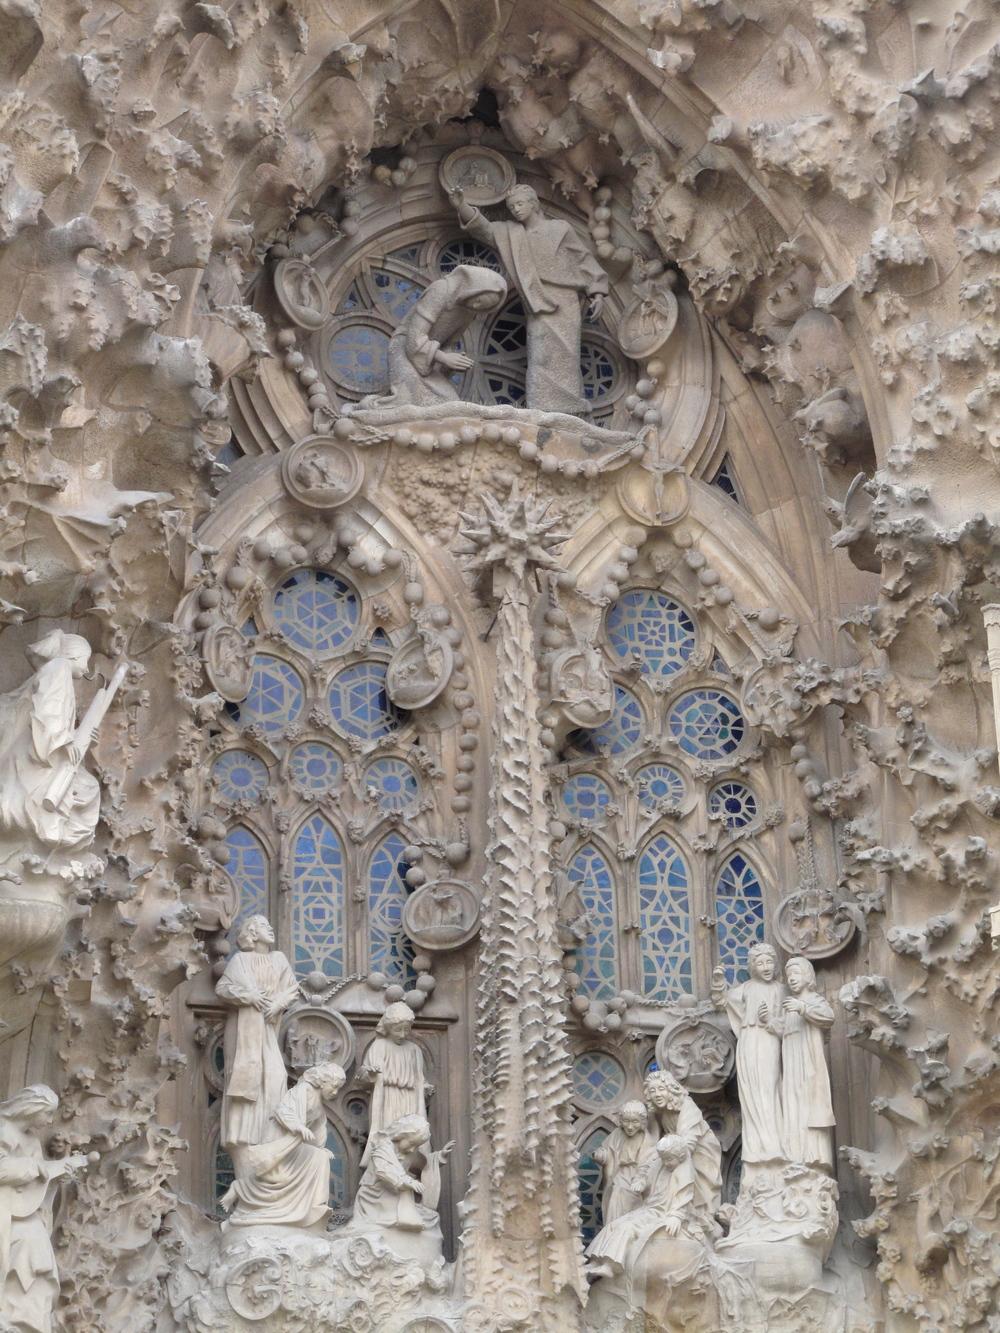 Façade at Gaudí's Sagrada Familia